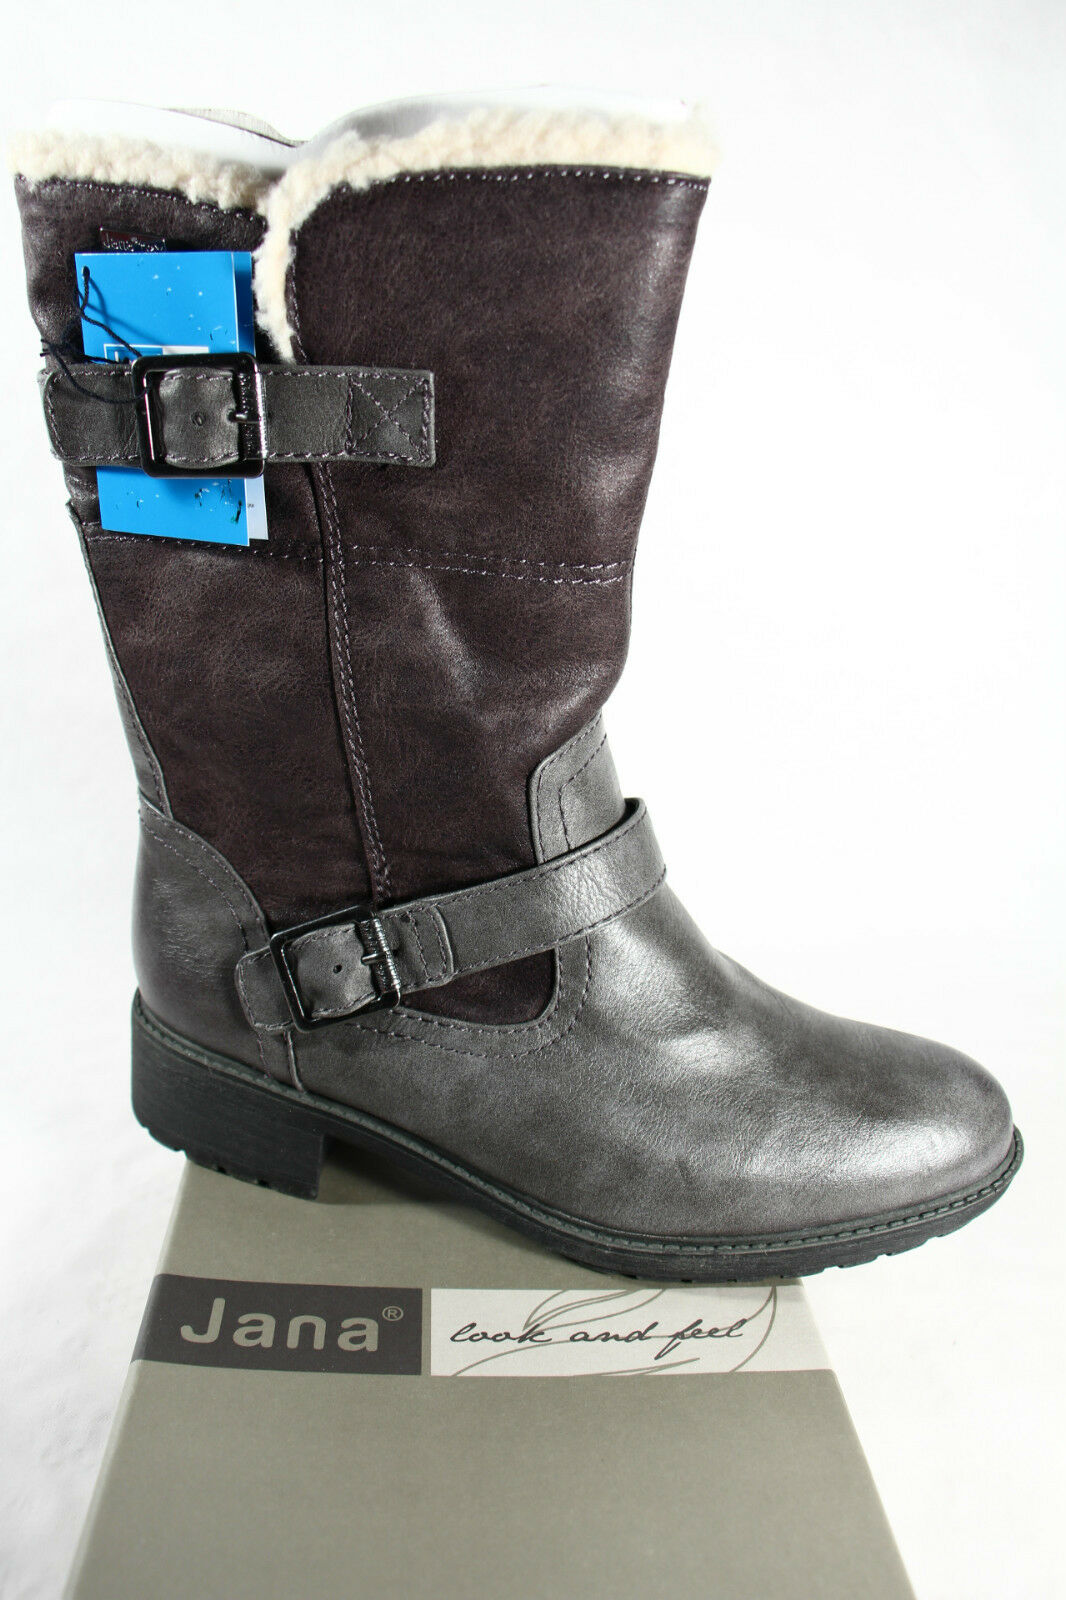 Jana Tex Stiefel, Winterstiefel, Stiefel grau, Warmfutter; Profilsohle RV26441 NEU